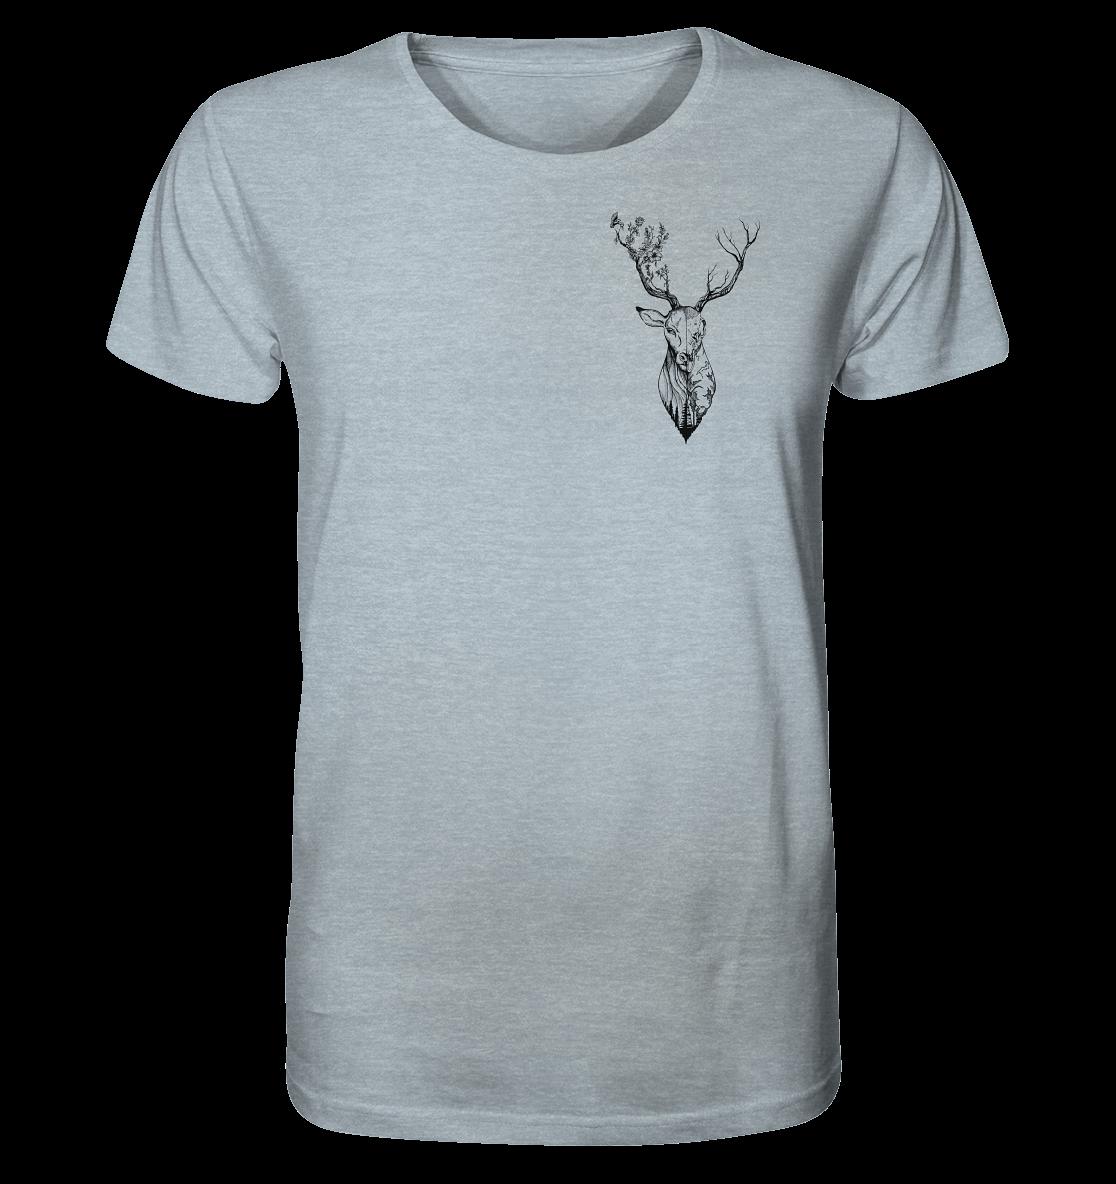 front-organic-shirt-meliert-adbfcb-1116x-7.png